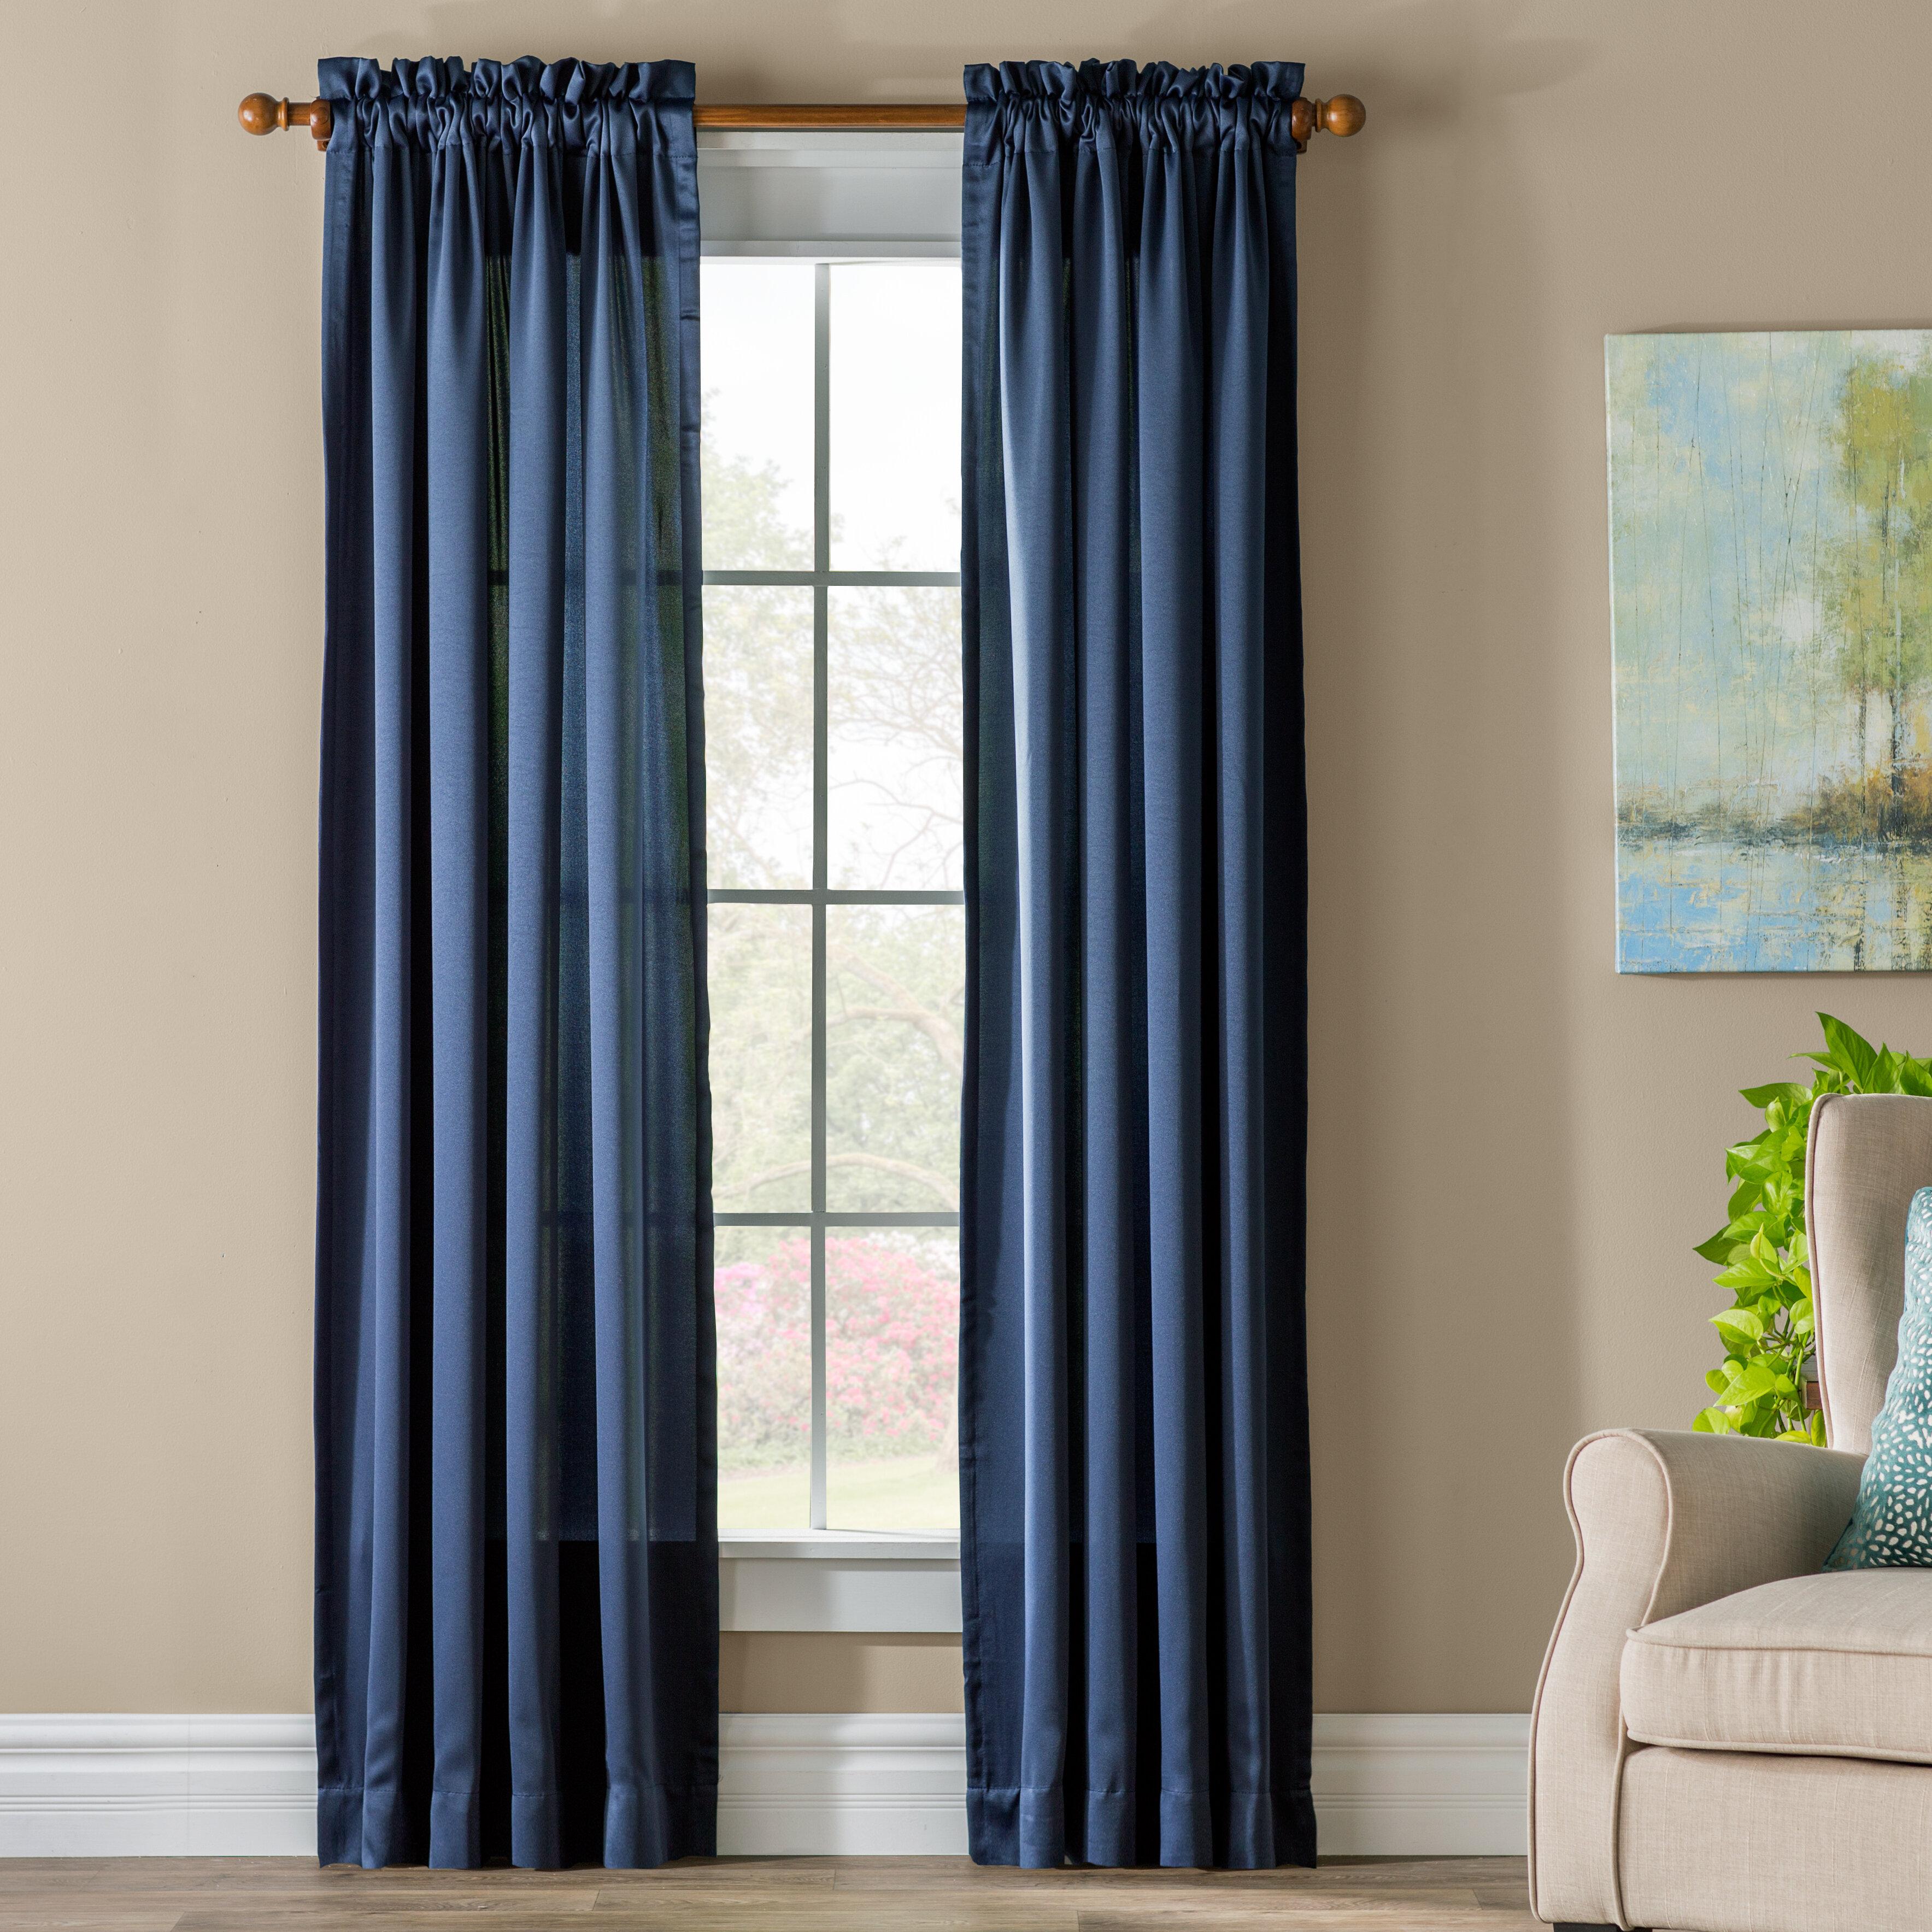 Wayfair Basics Solid Room Darkening Thermal Rod Pocket Single Curtain Panel Reviews Wayfair